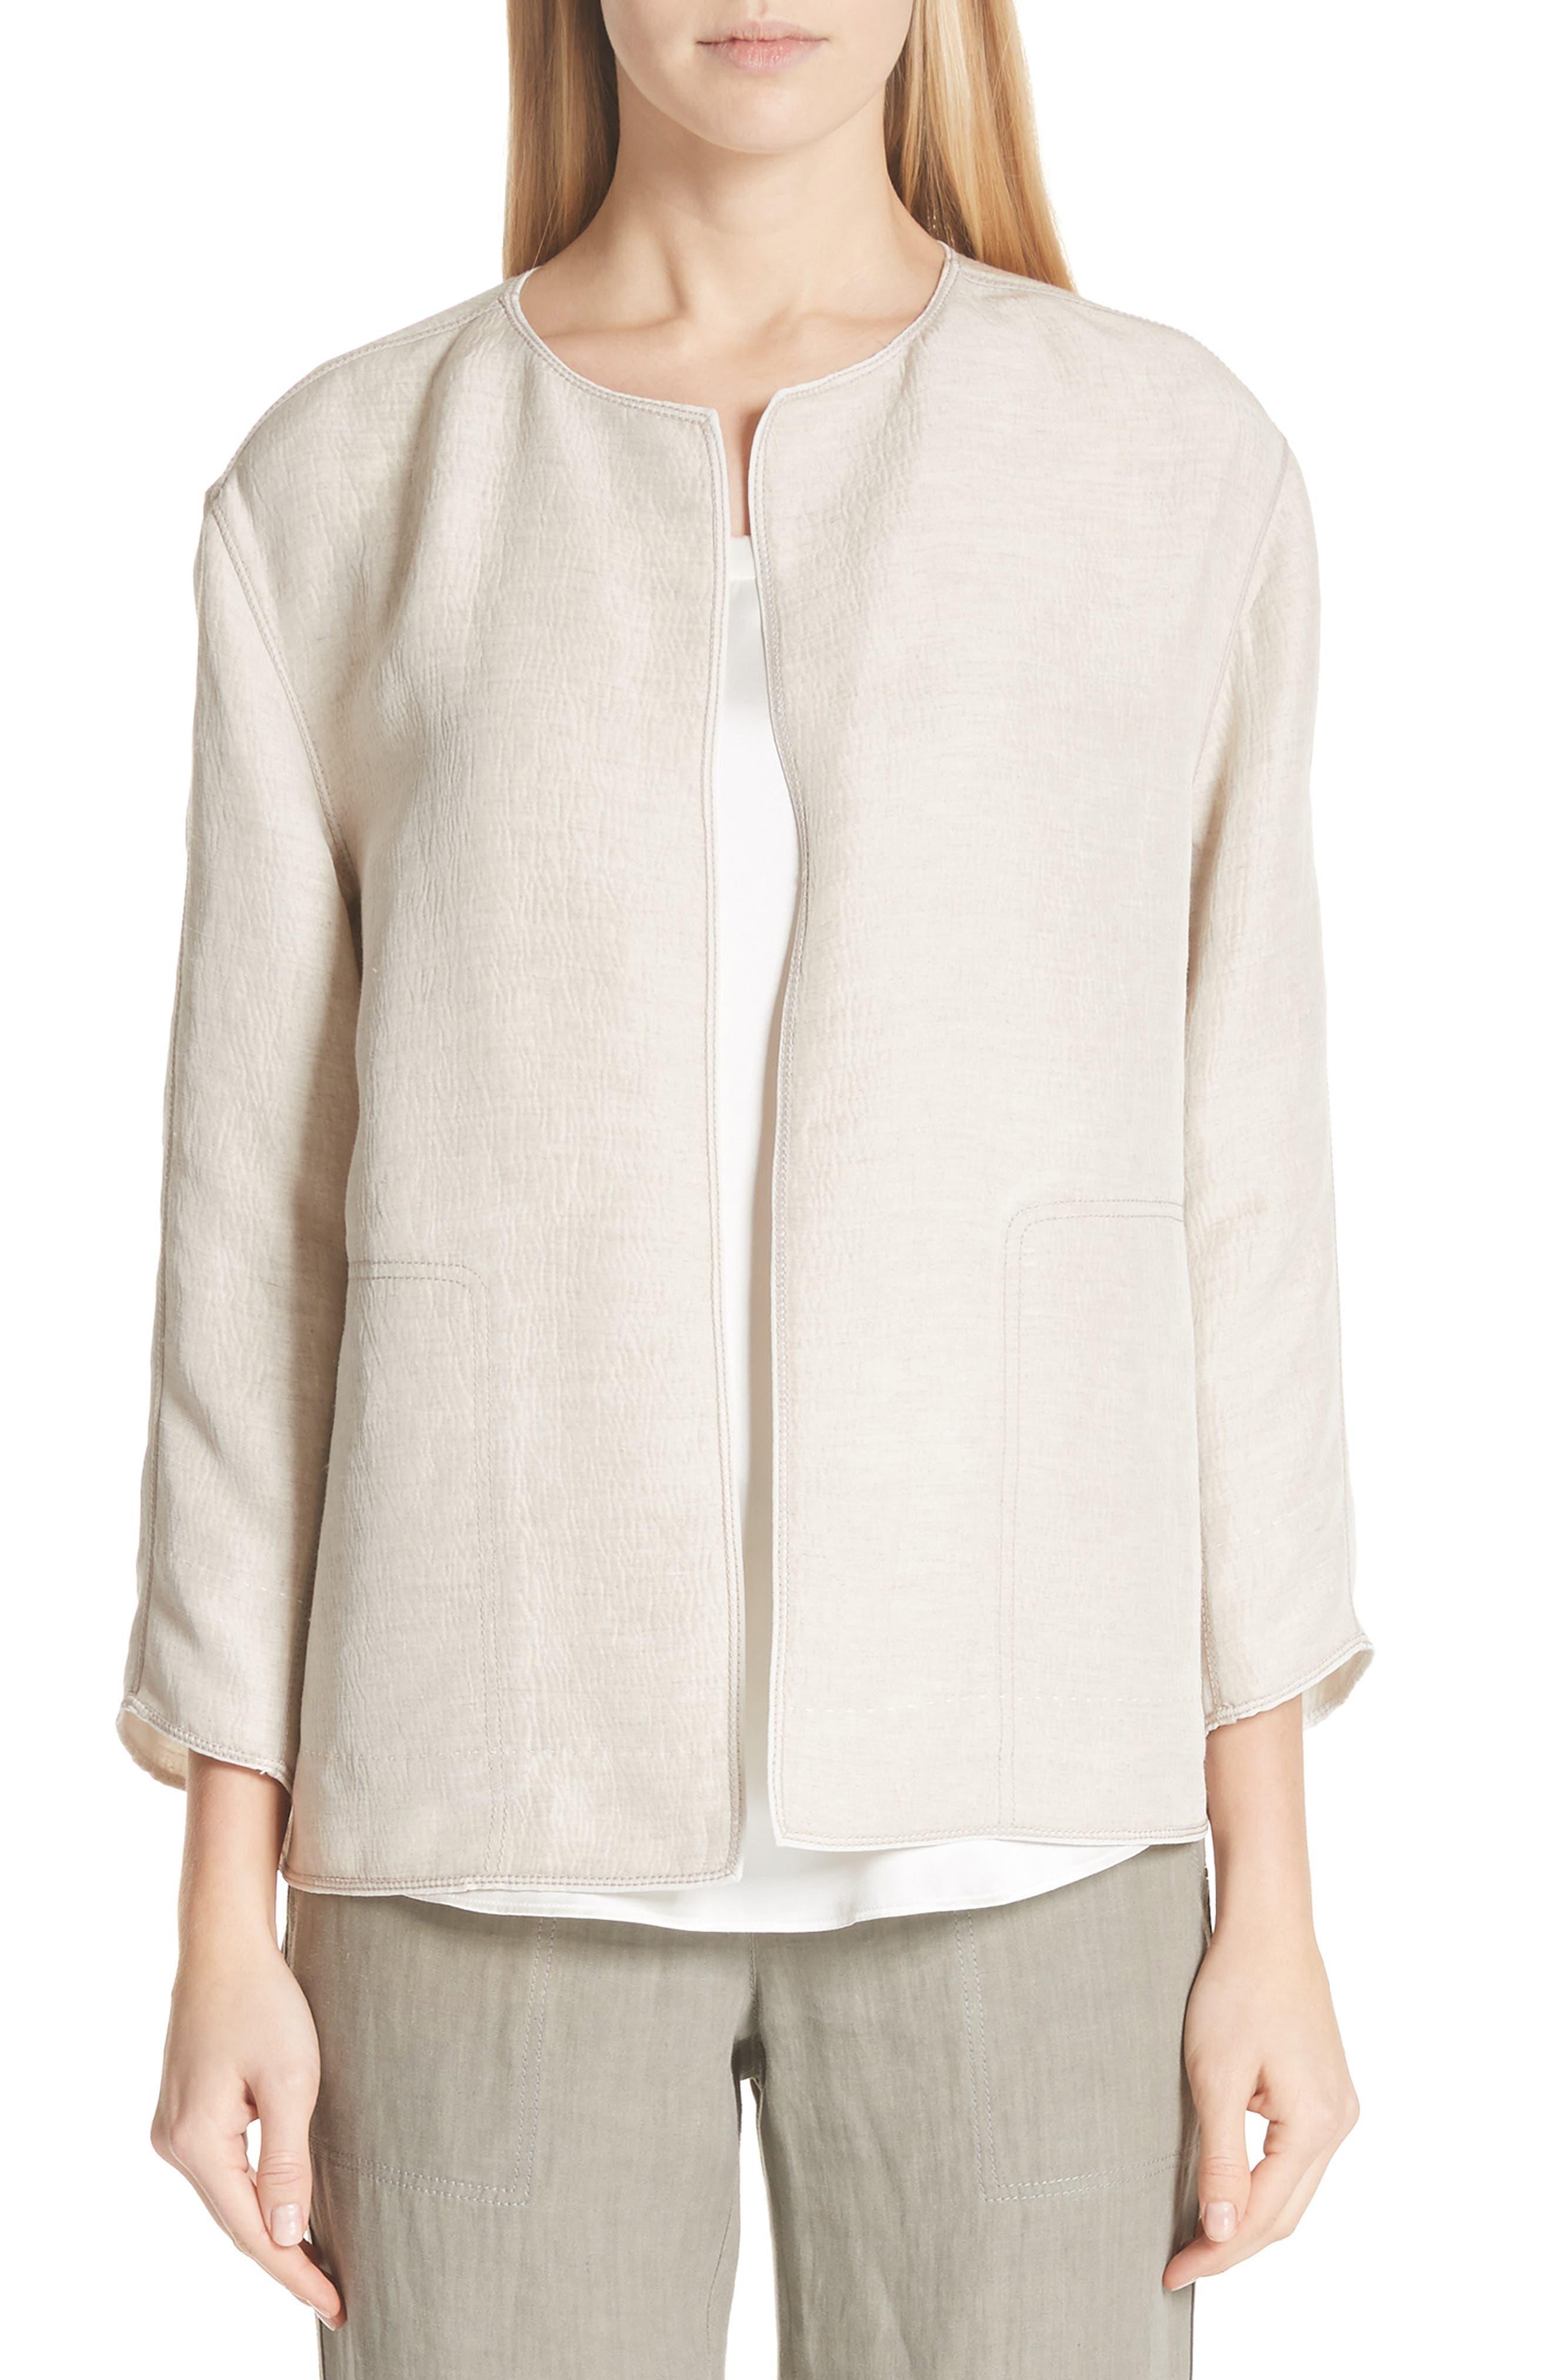 Milo Textured Jacket,                         Main,                         color, Khaki Multi